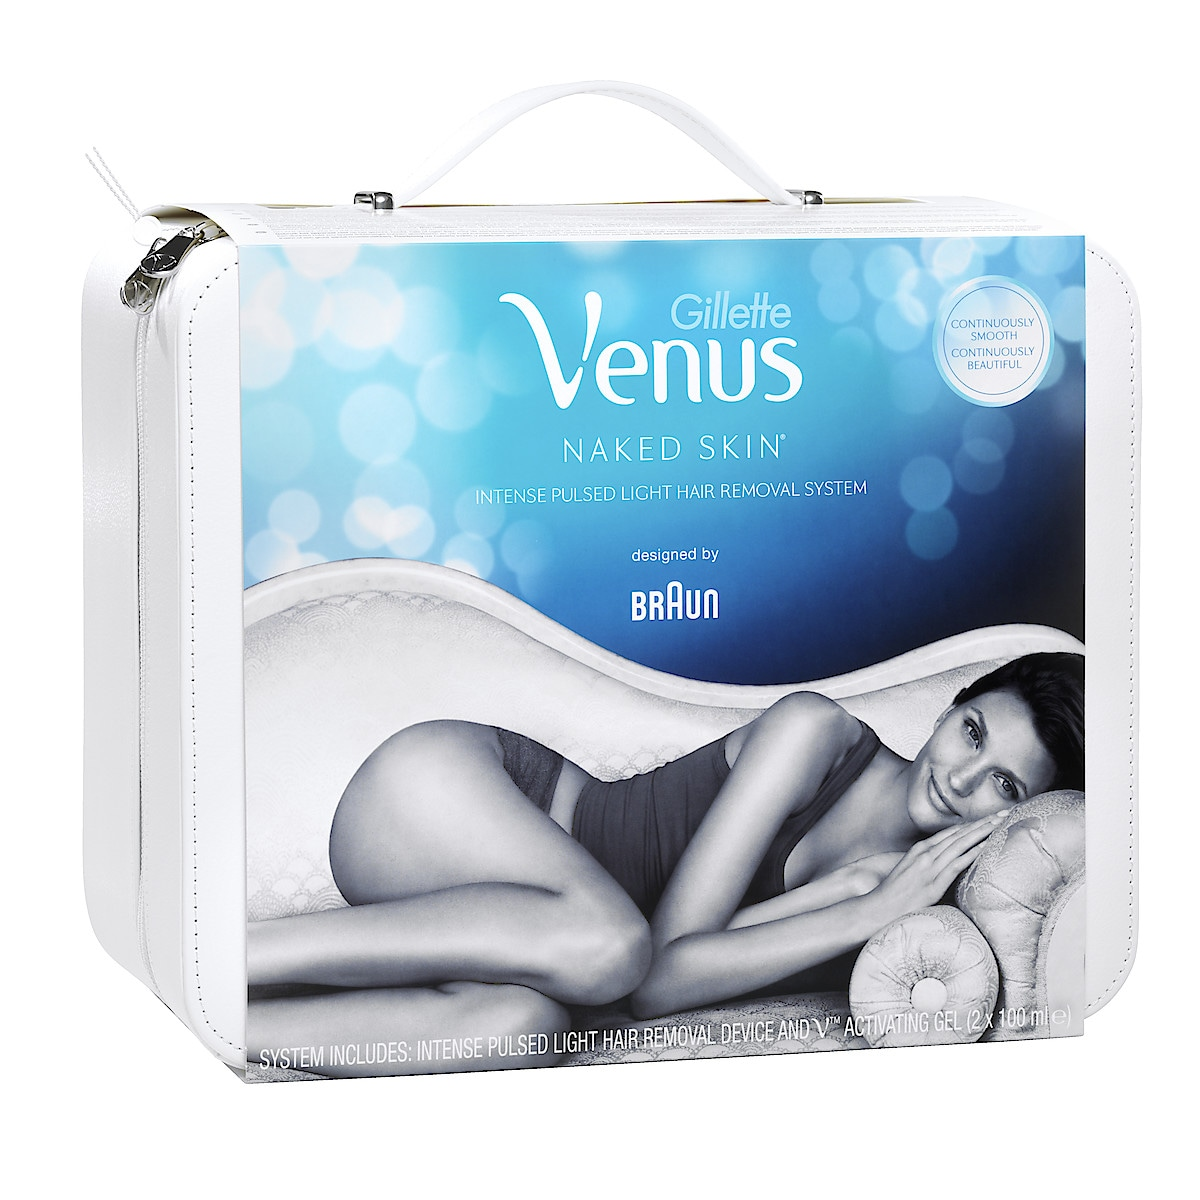 Hårborttagare Gillette Venus Naked Skin